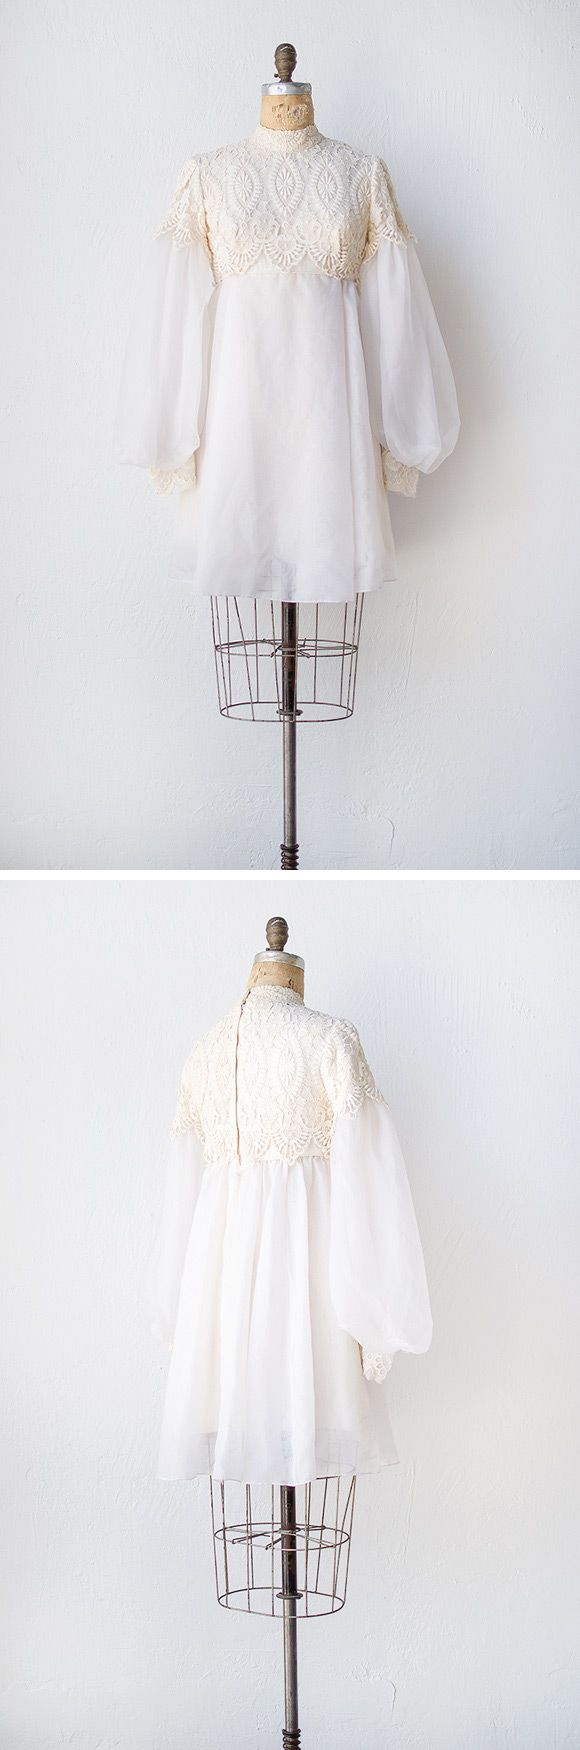 1960s inspired wedding dress